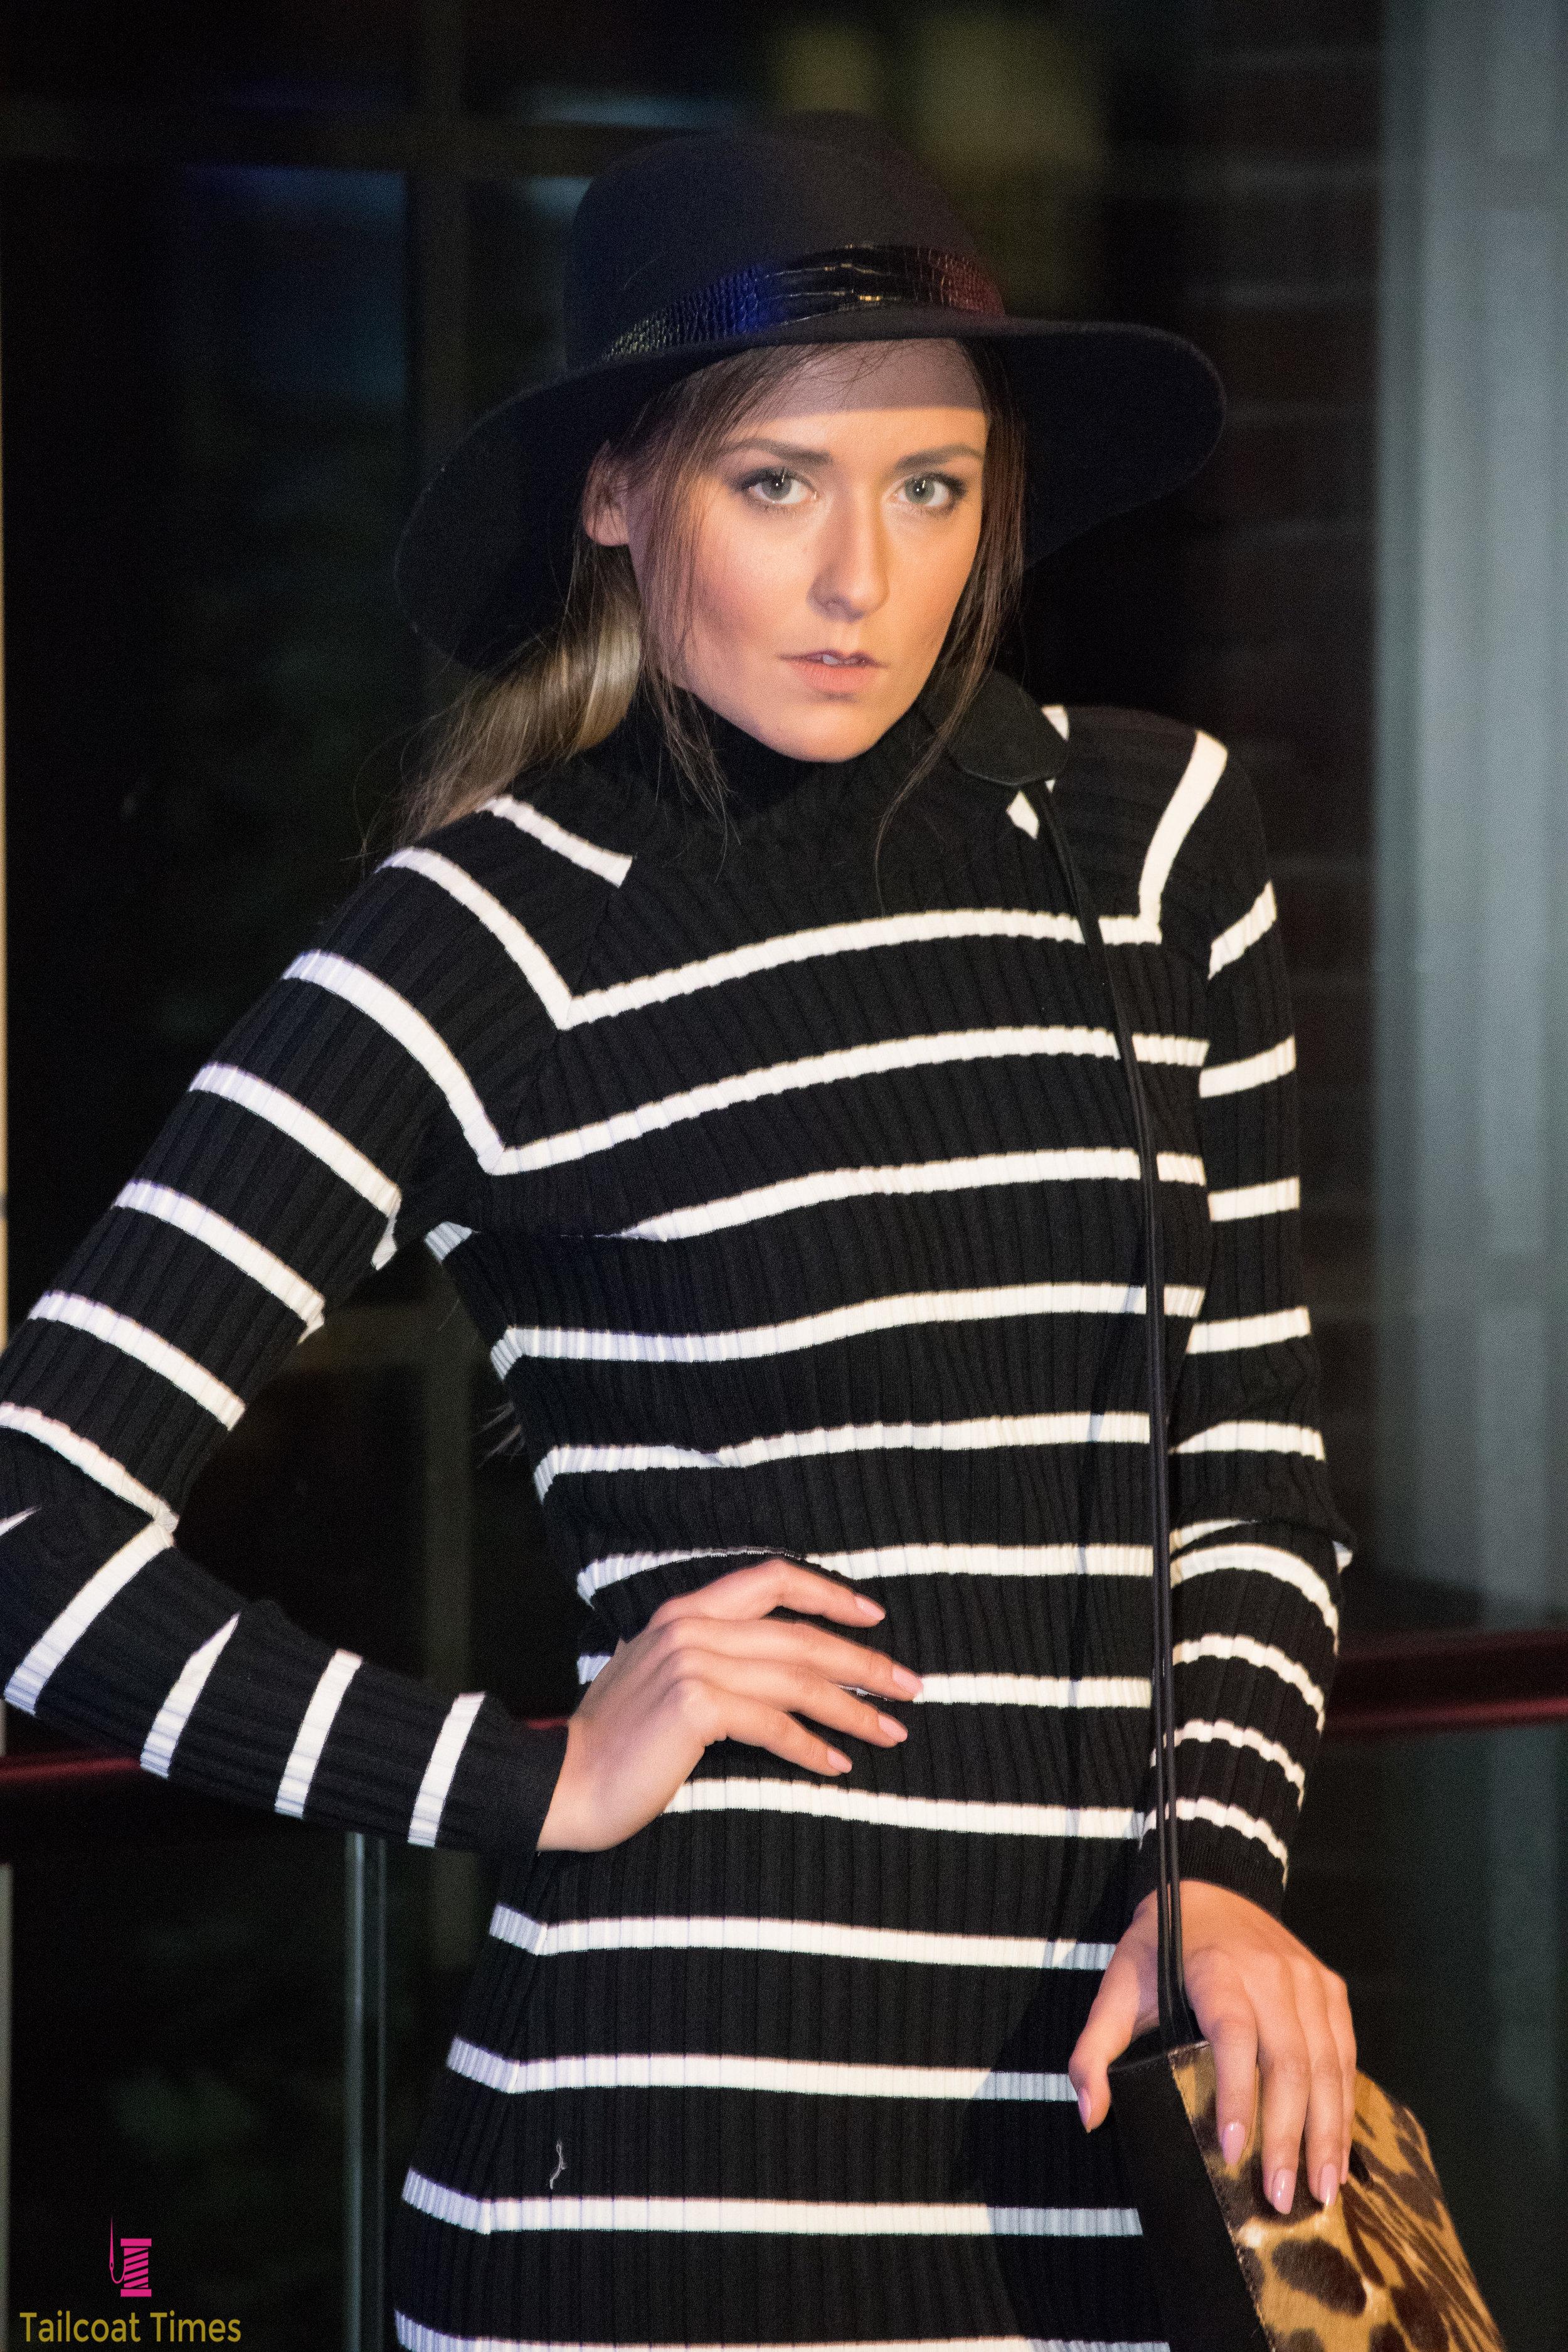 FashionablyLate_TrunkShow_Tailcoat Times (39 of 48).jpg